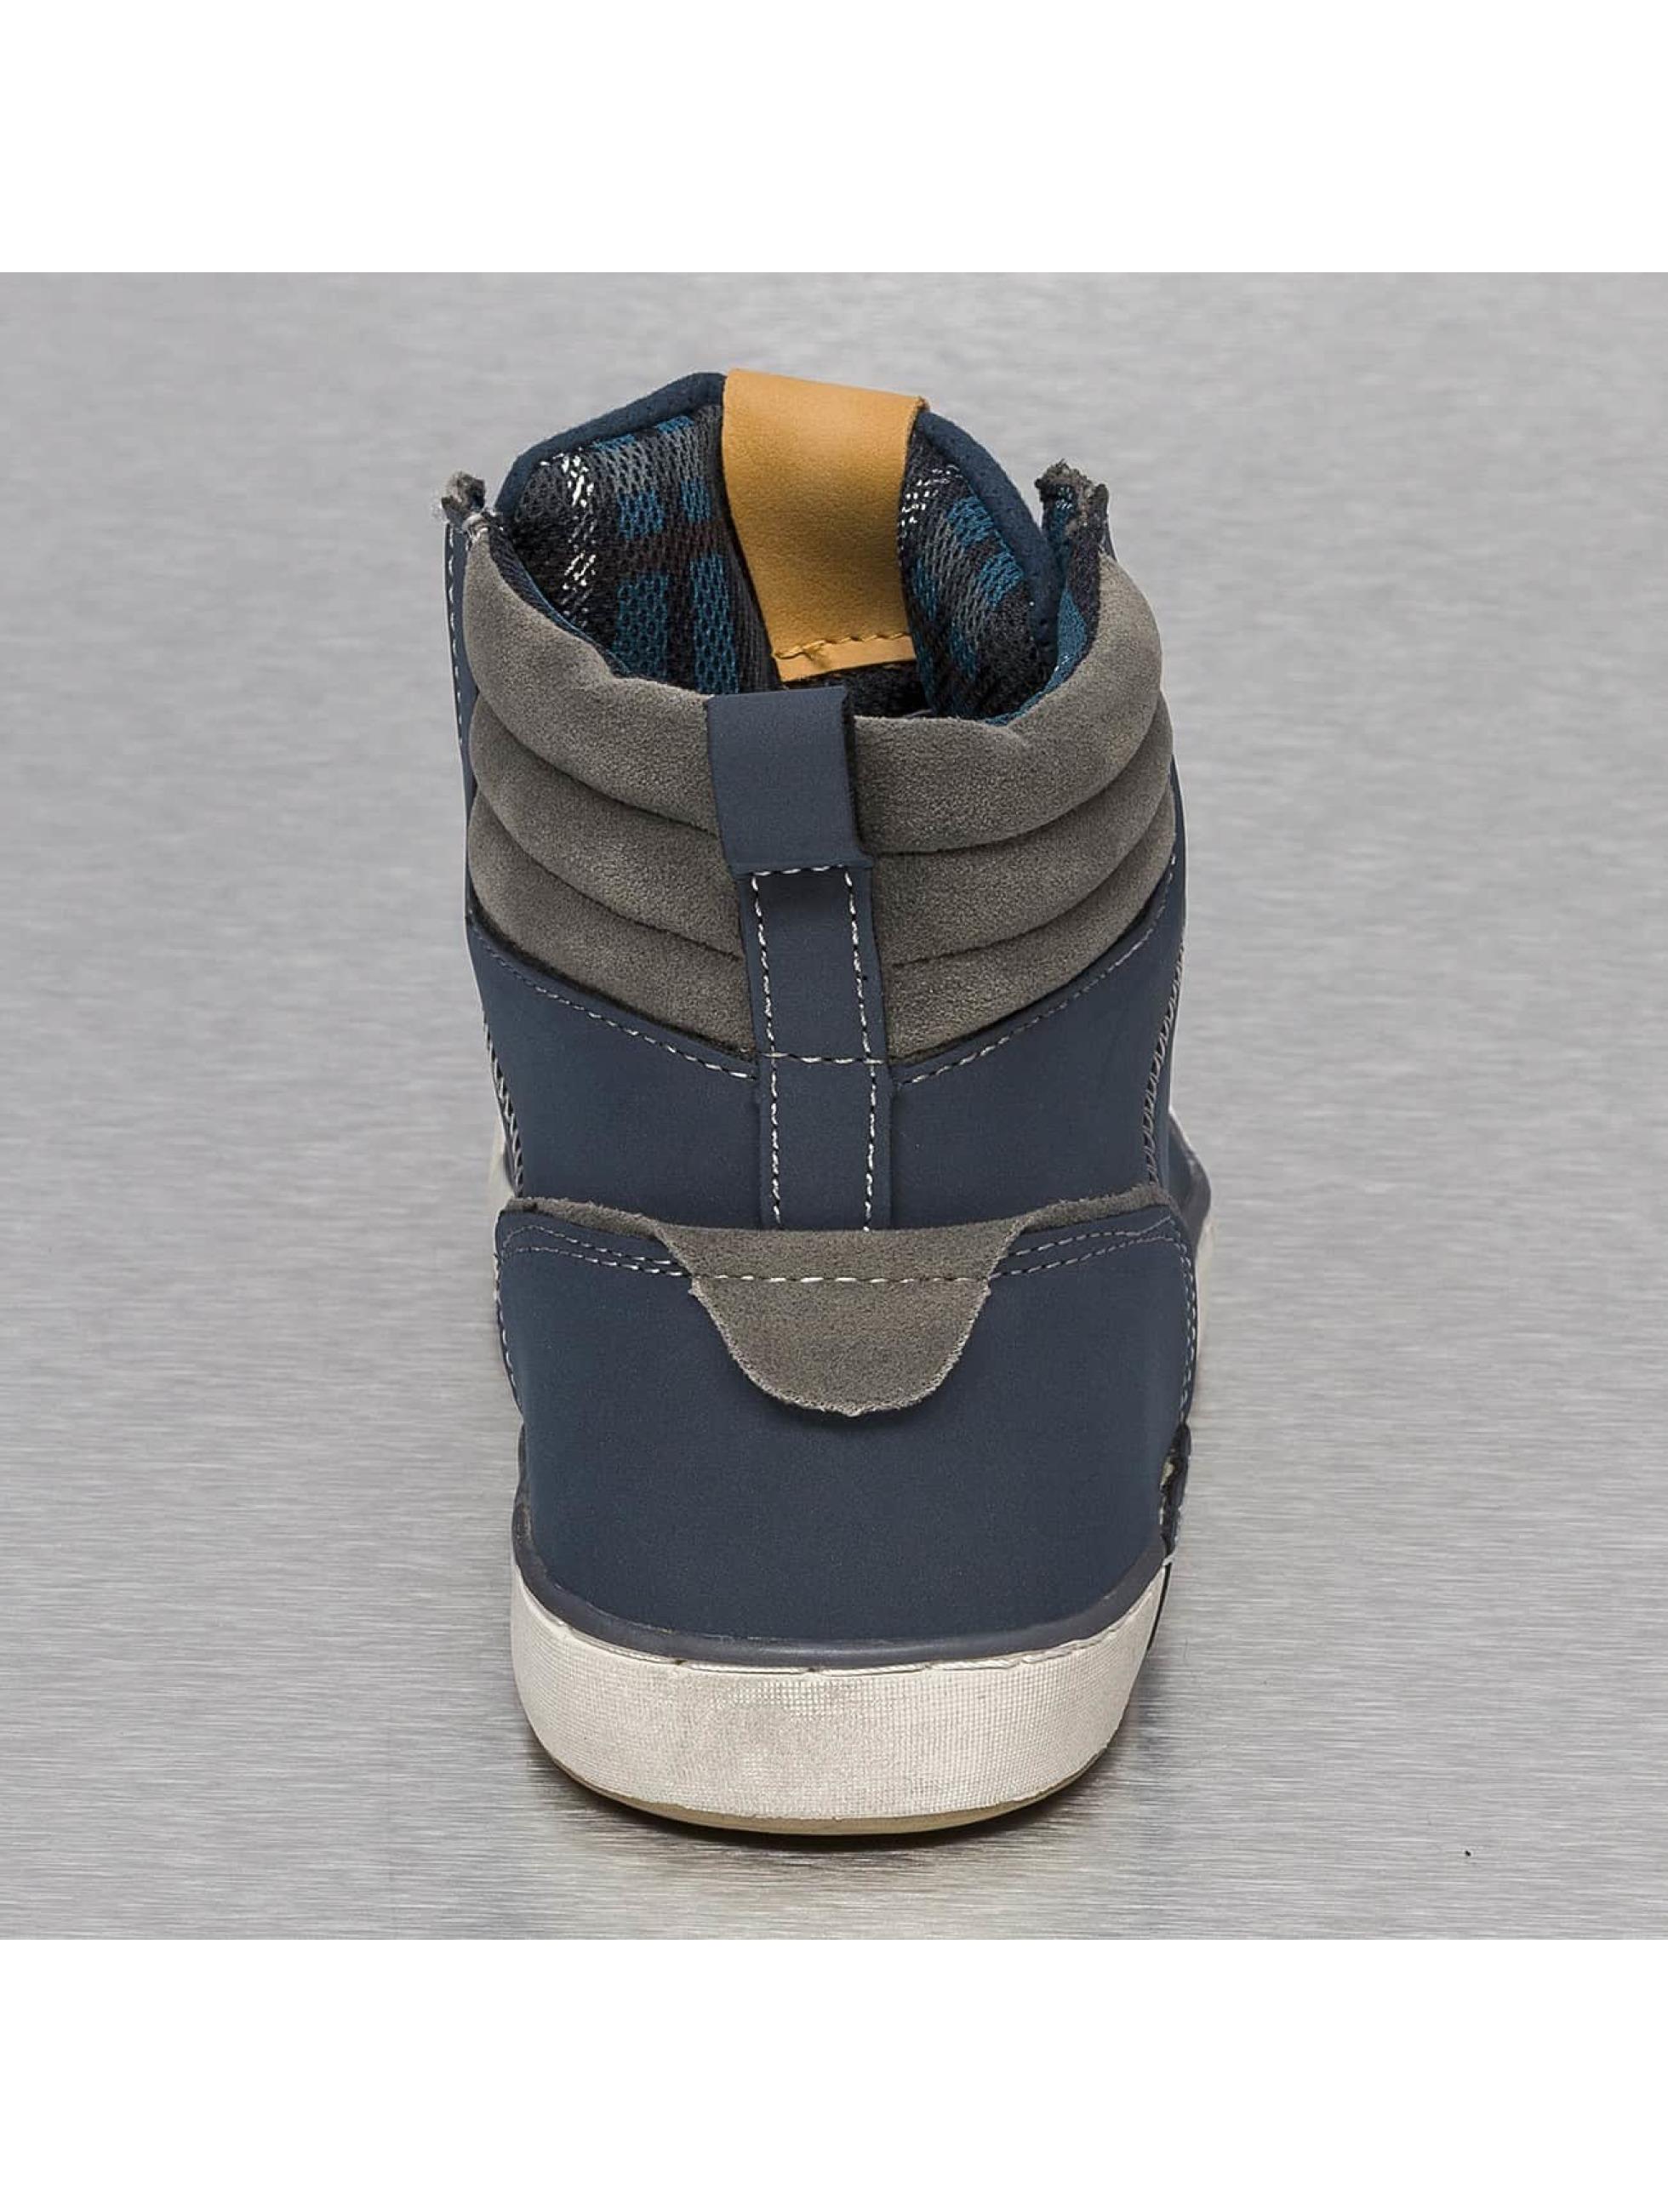 New York Style Sneaker Toronto blau